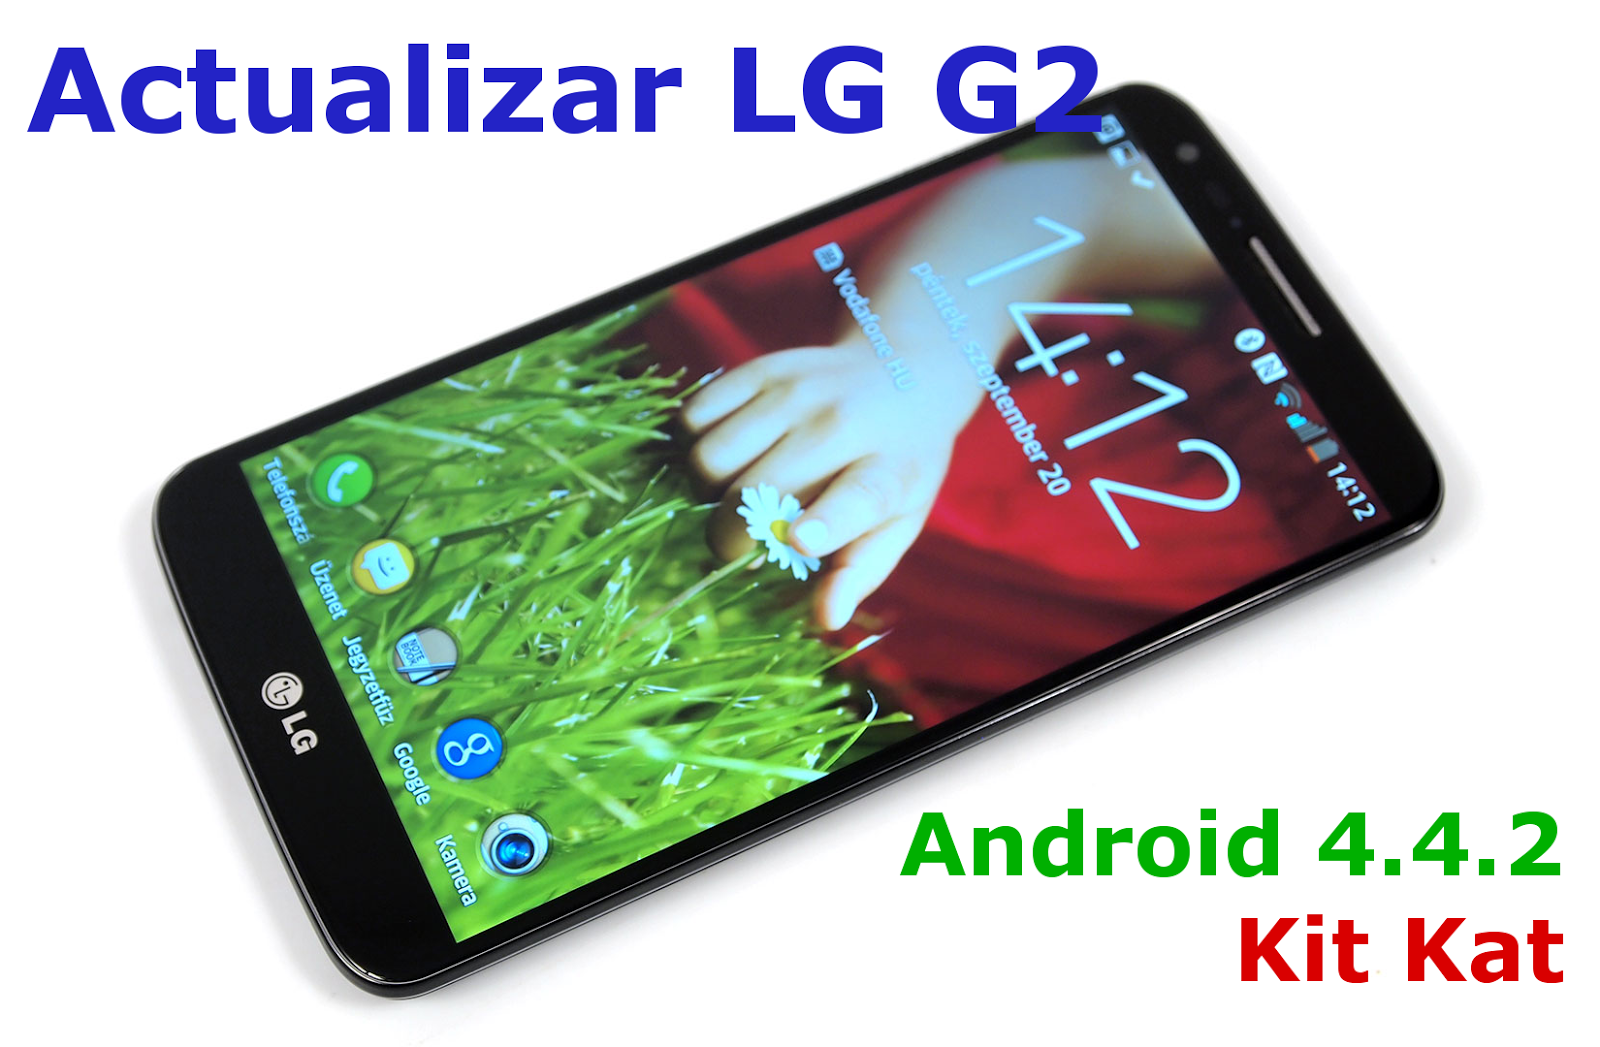 Cómo actualizar tu LG G2 a Android 4.4.2 Kit Kat